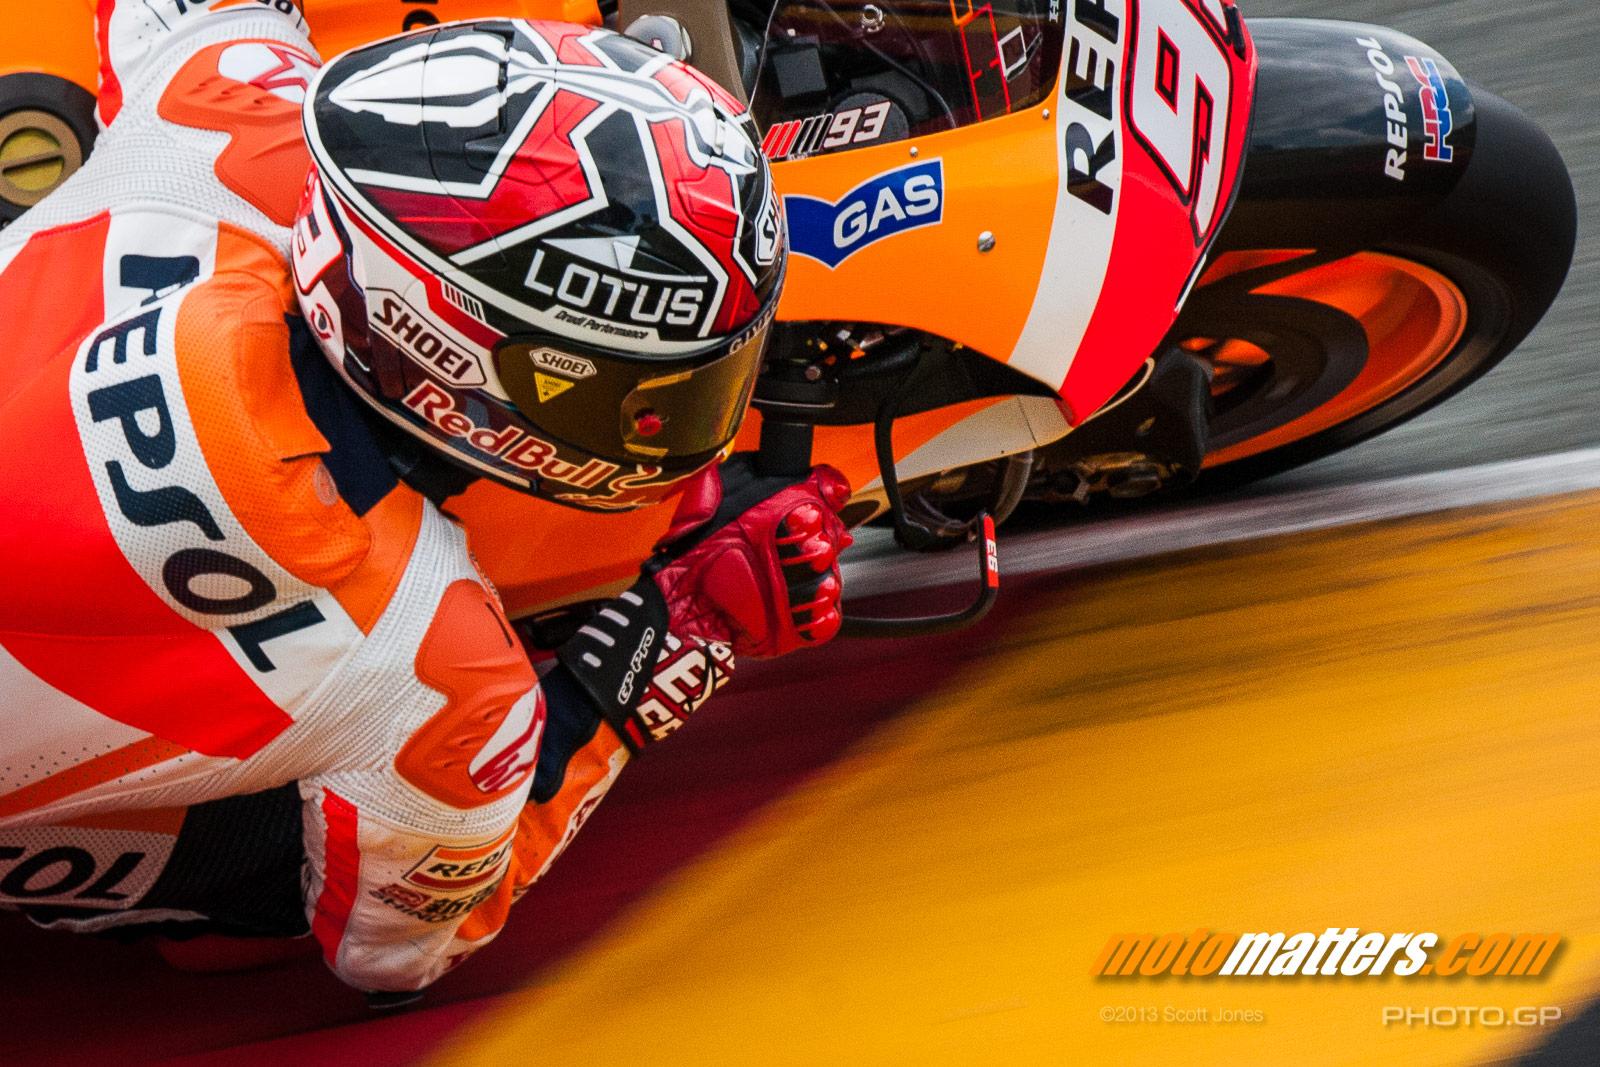 GP Sachsenring - Page 2 2013-MotoGP-08-Sachsenring-Saturday-0586-O